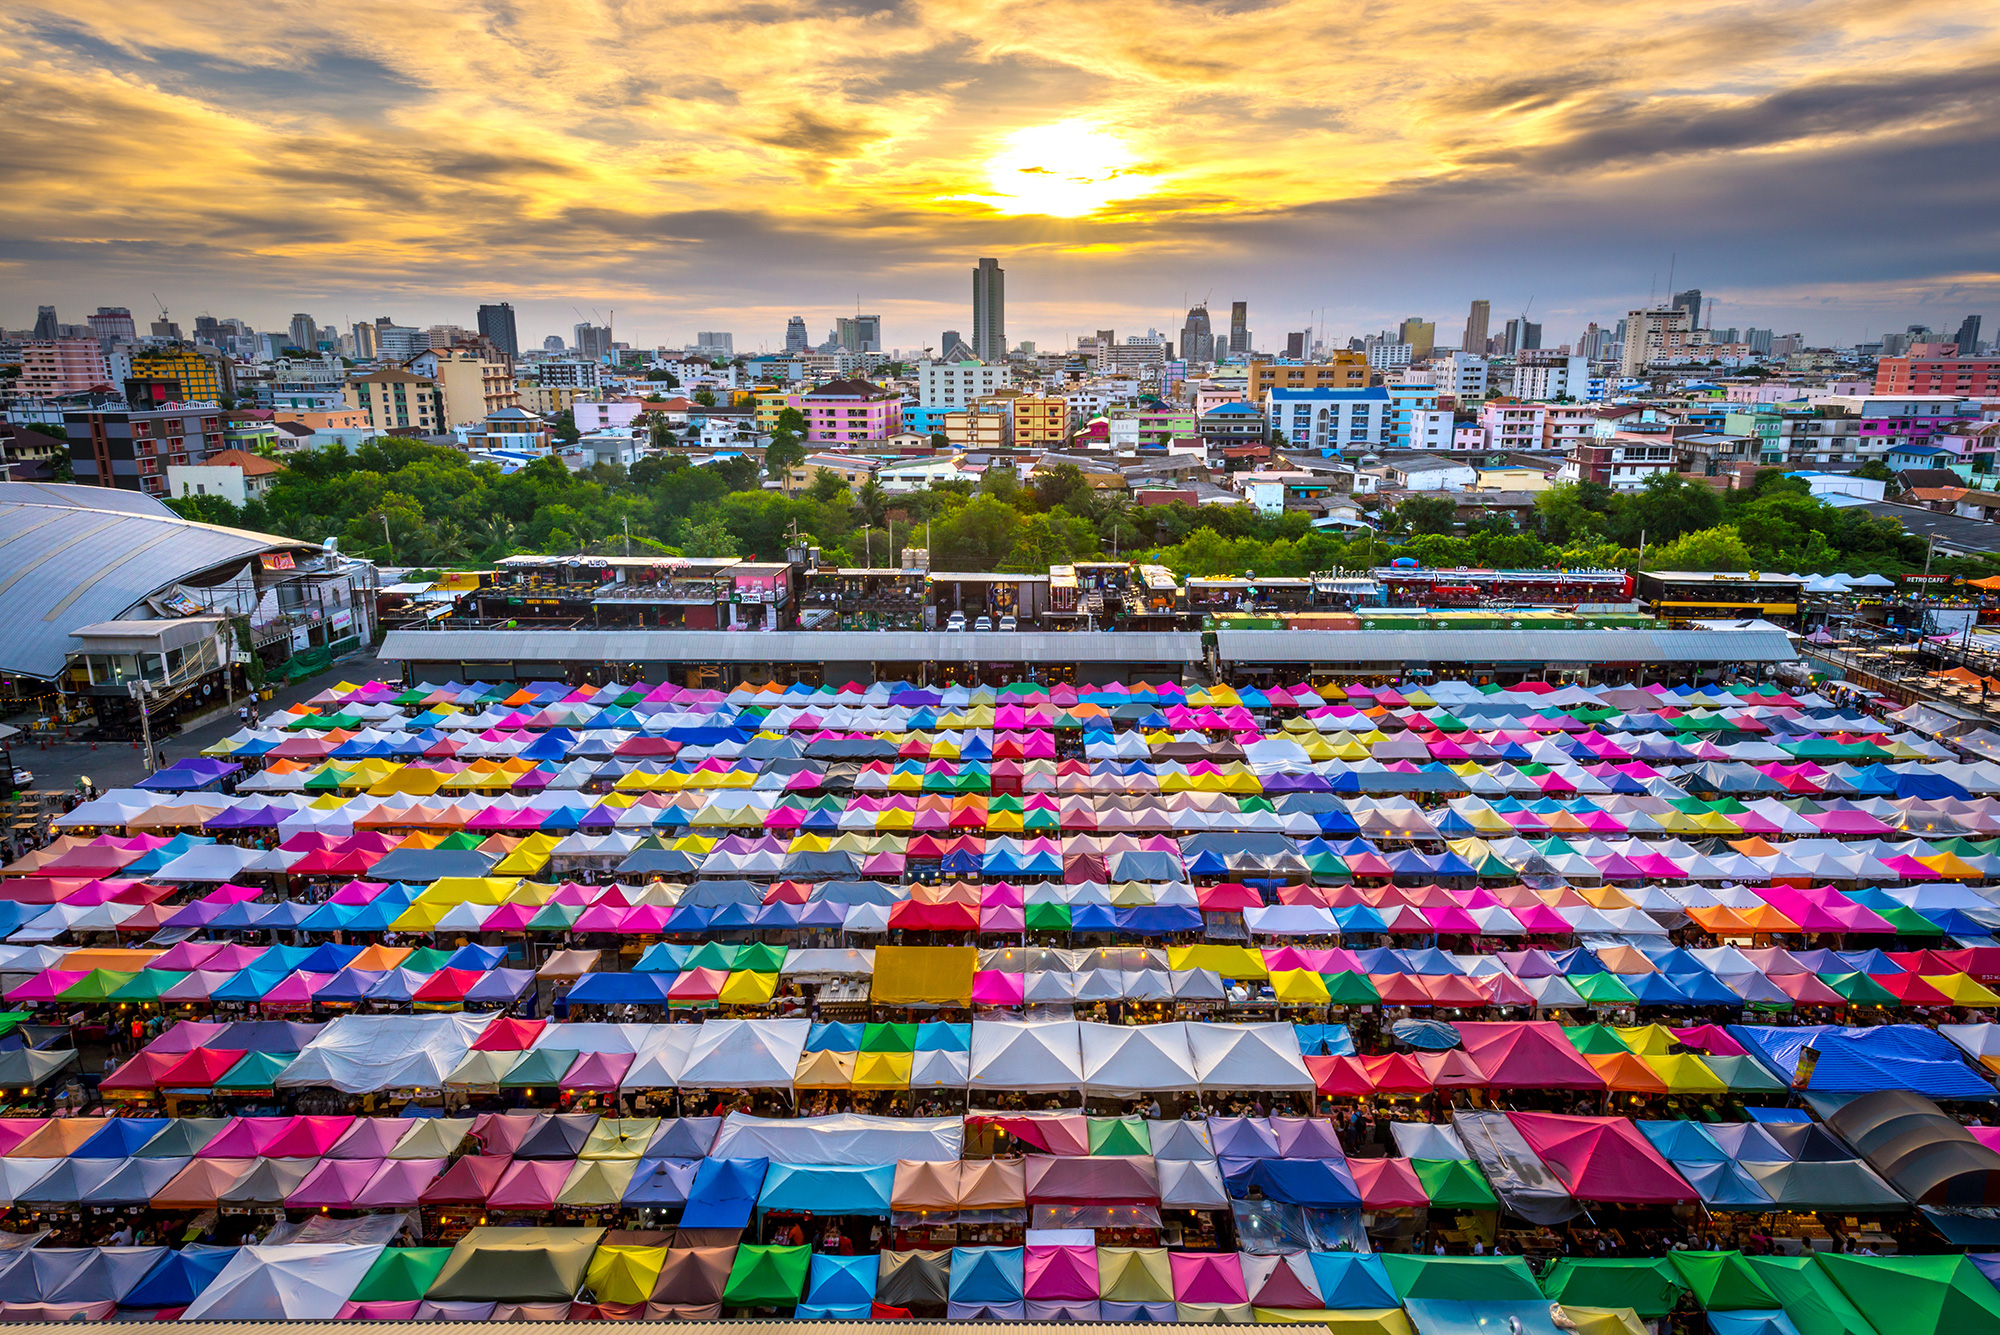 Ratchada Night Train Market, Bangkok, Thailand from Shutterstock